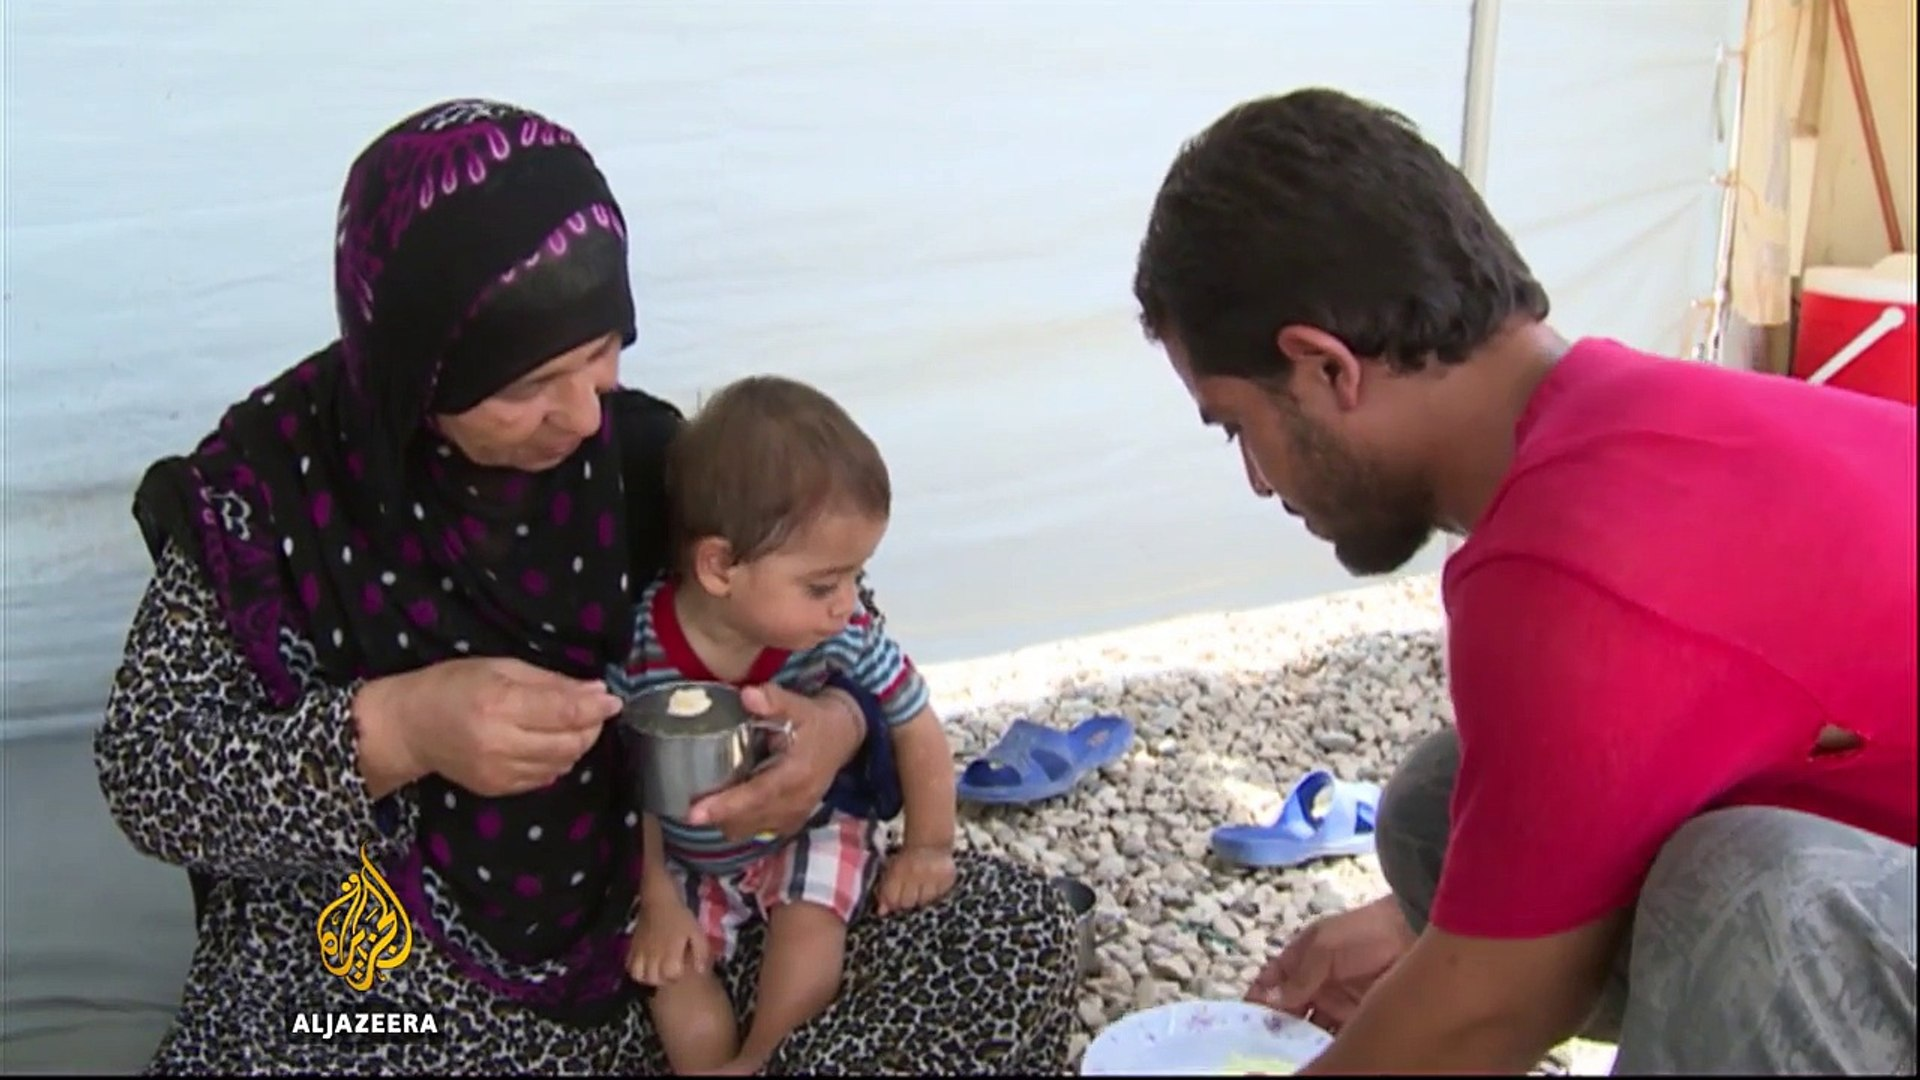 Mosul: Iraqi teams find bodies under rubble